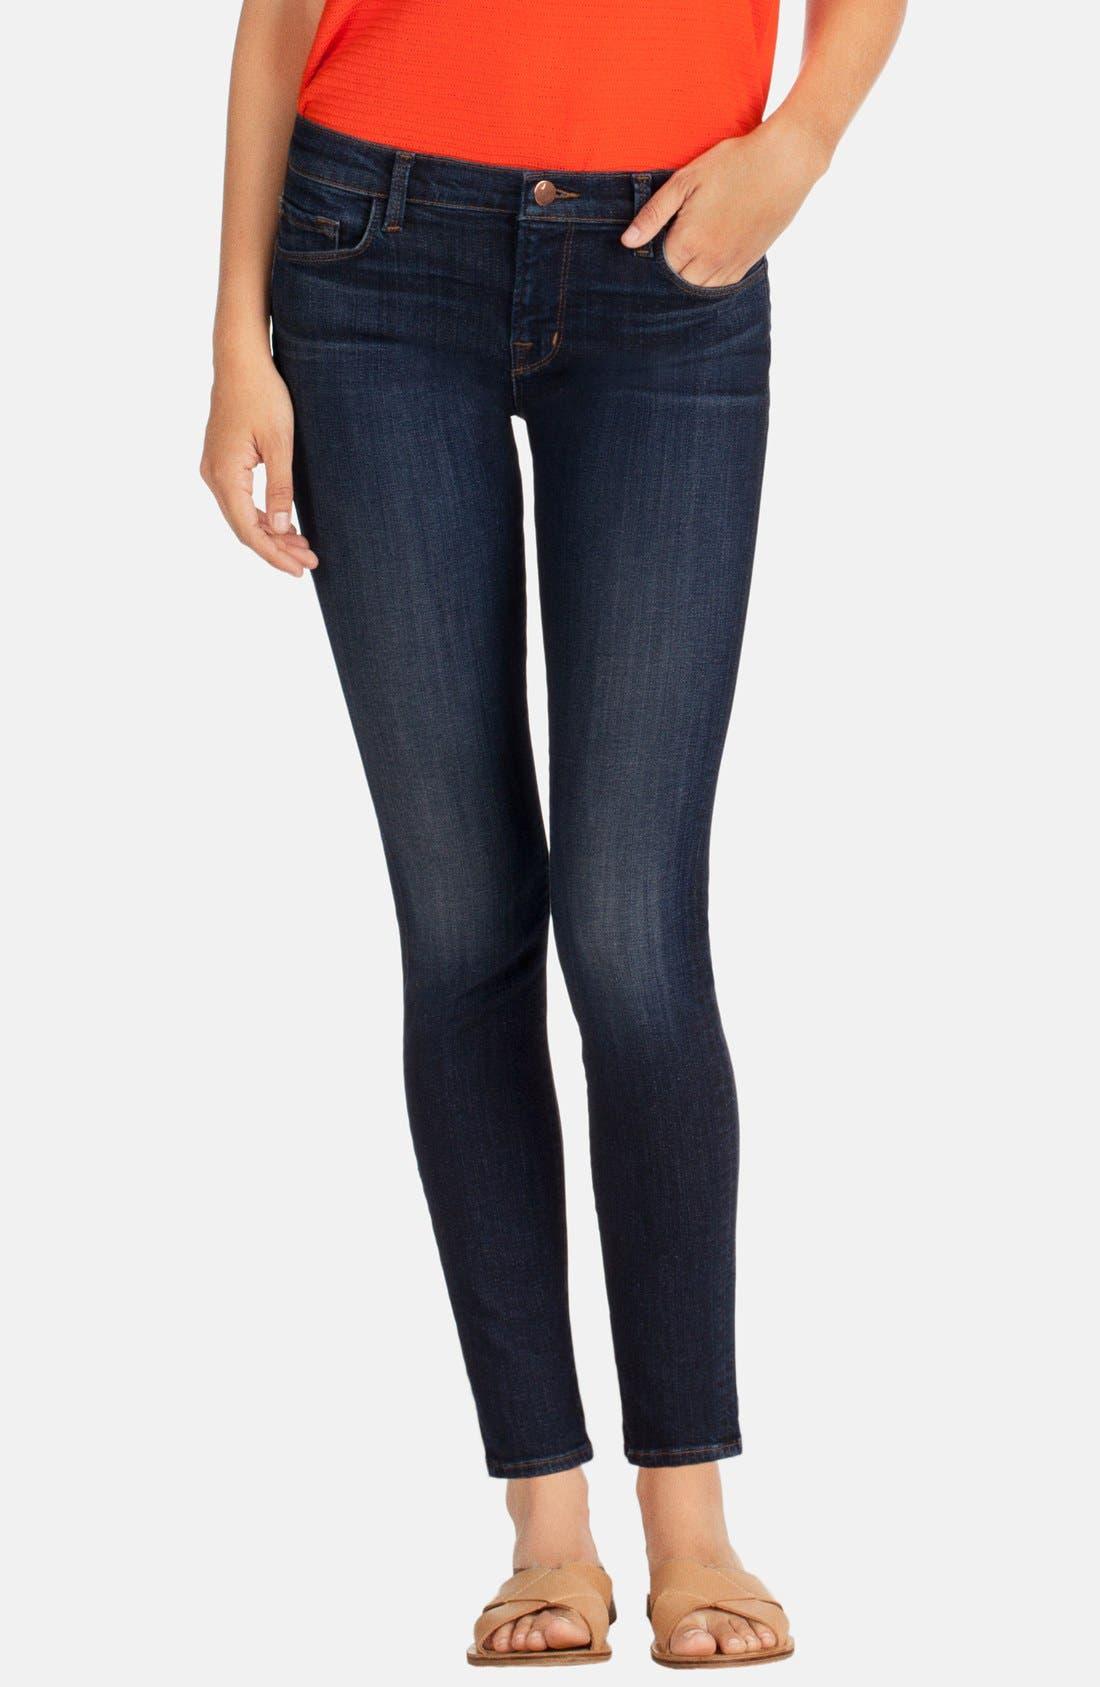 Alternate Image 1 Selected - J Brand Mid-Rise Skinny Jeans (Oblivion)